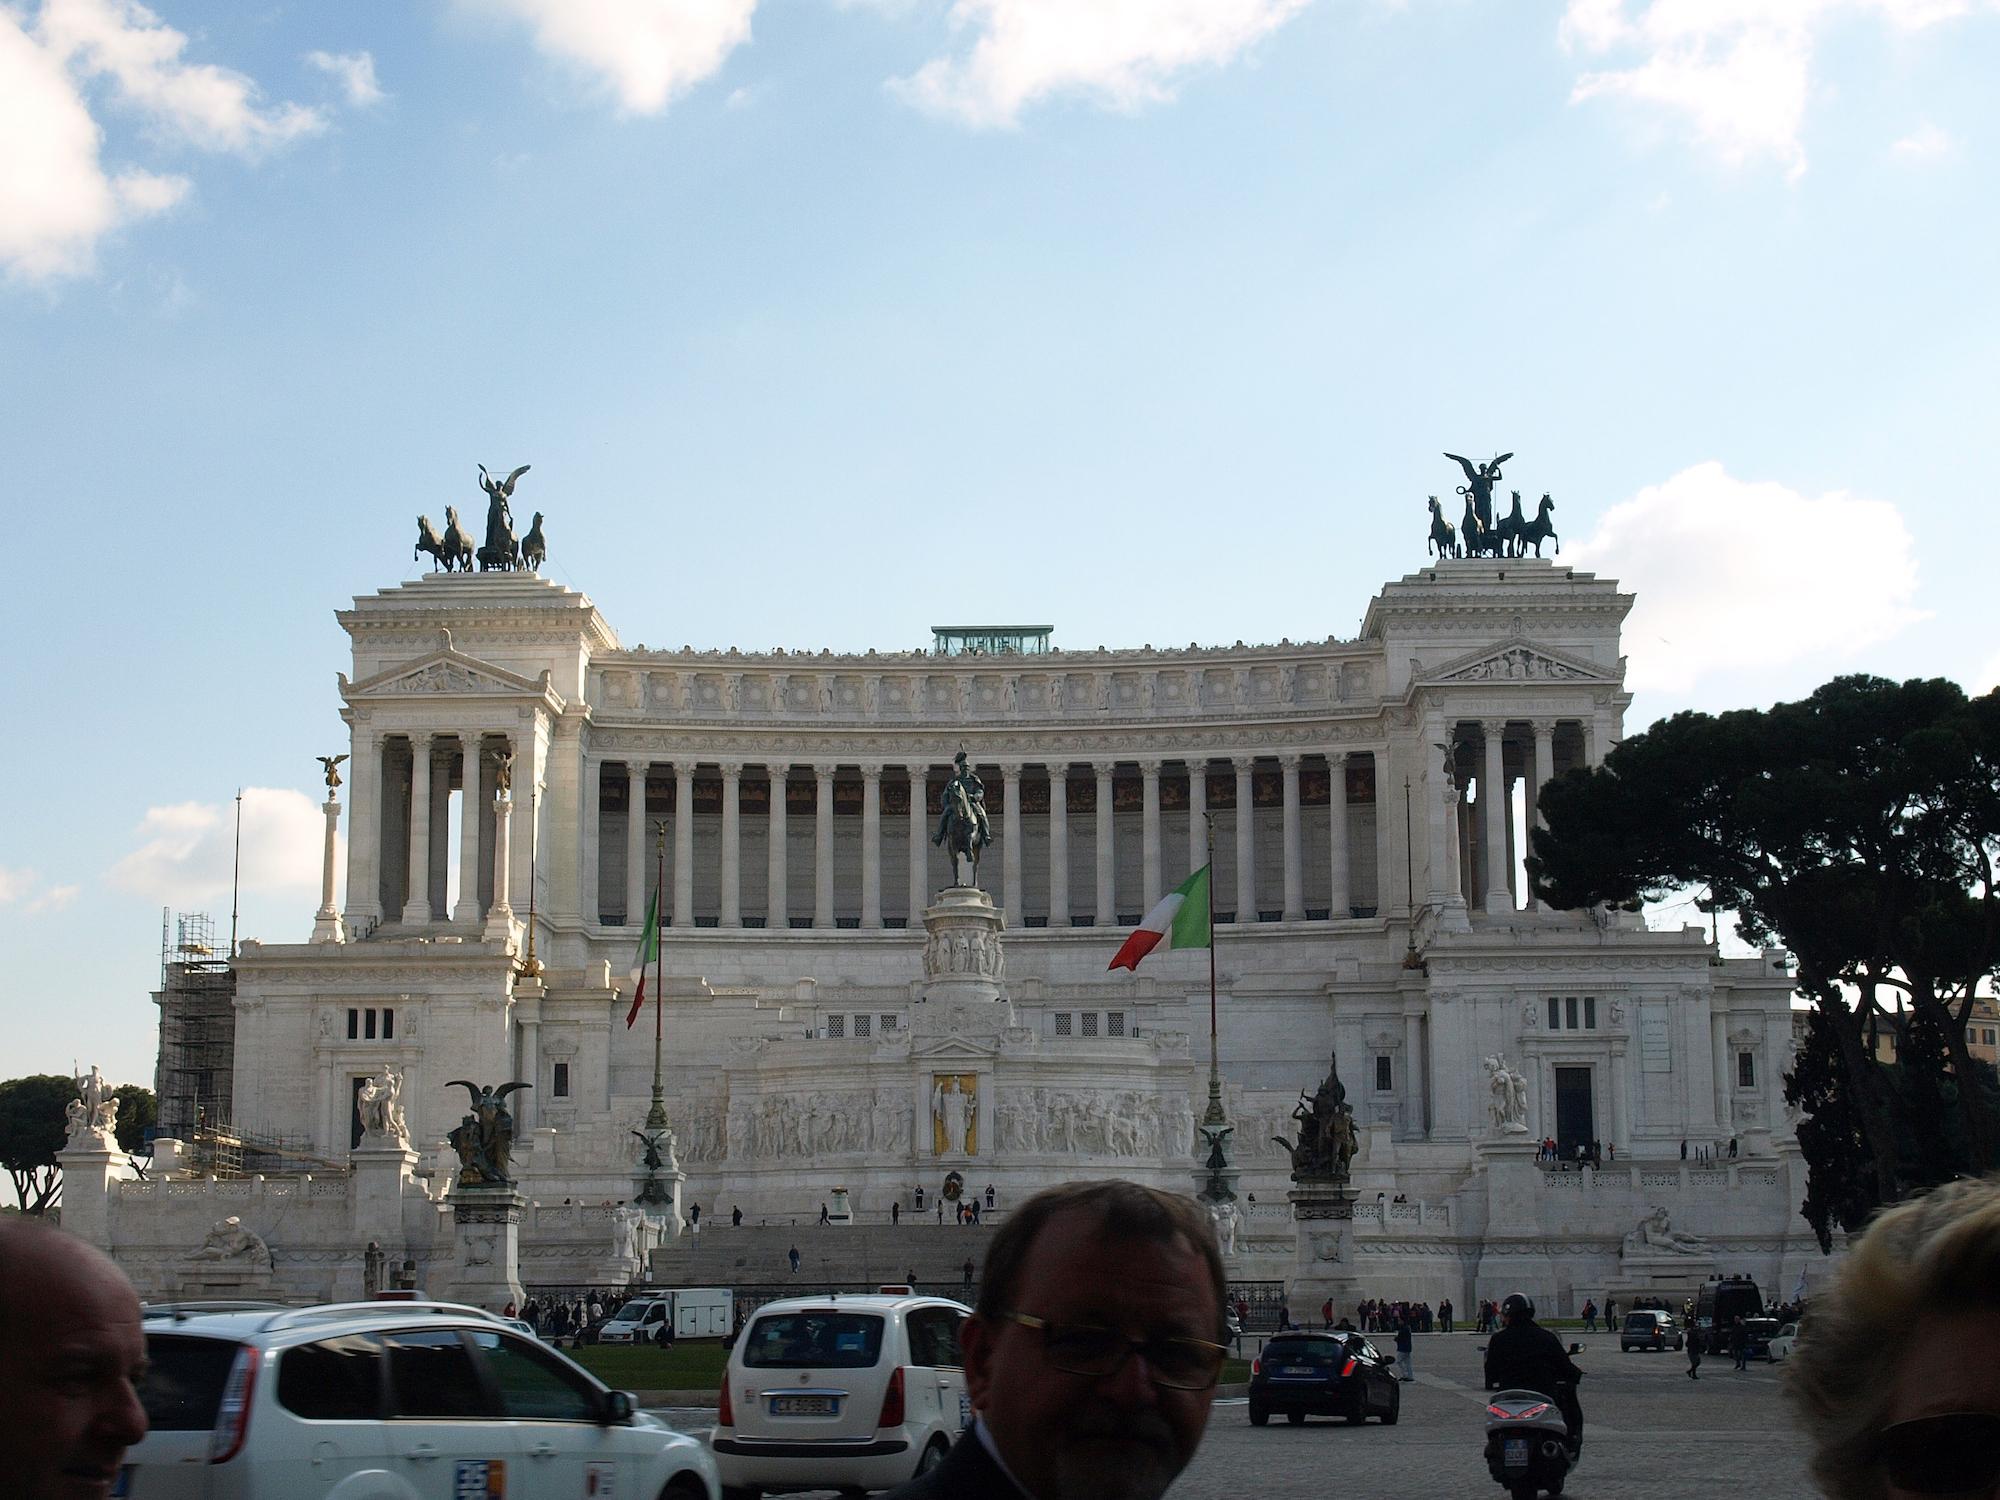 Altare della Patria (Altar of the Fatherland)   at Piazza Venezia, Italy  / Geena Matuson @geenamatuson #thegirlmirage